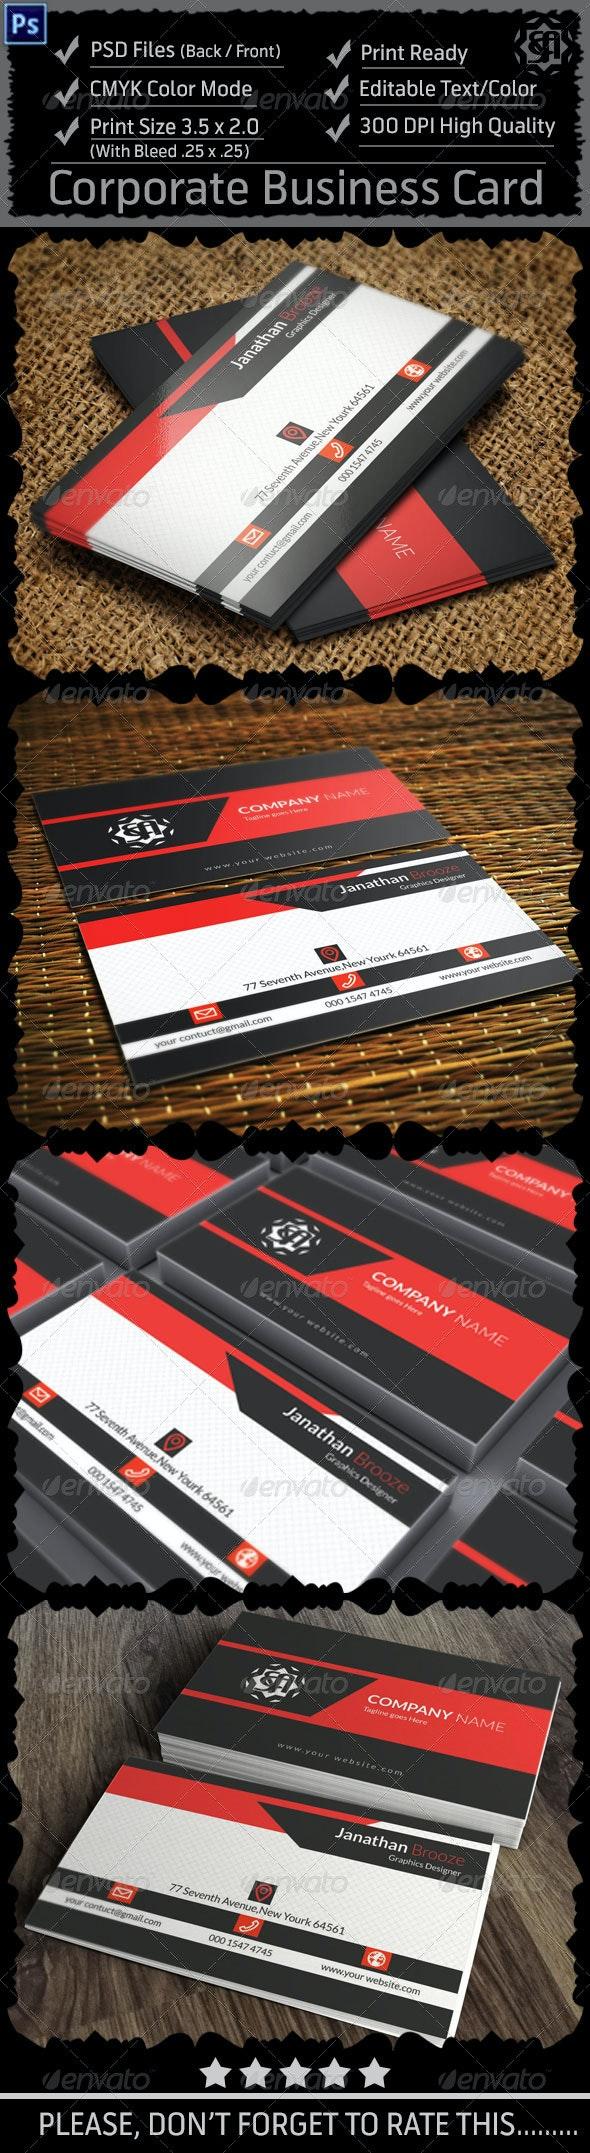 Corporate Business Card Vol : 7 - Corporate Business Cards